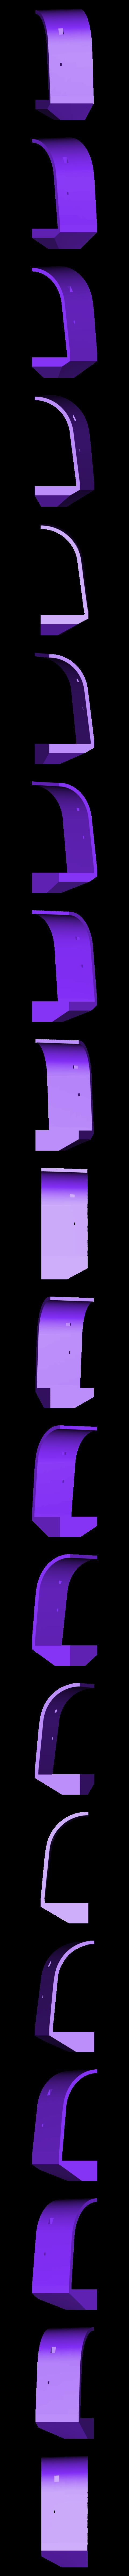 Boiler_Section_4-_SCALED-5.STL Download free STL file 4-8-8-4 Big Boy Locomotive • 3D printer object, RaymondDeLuca